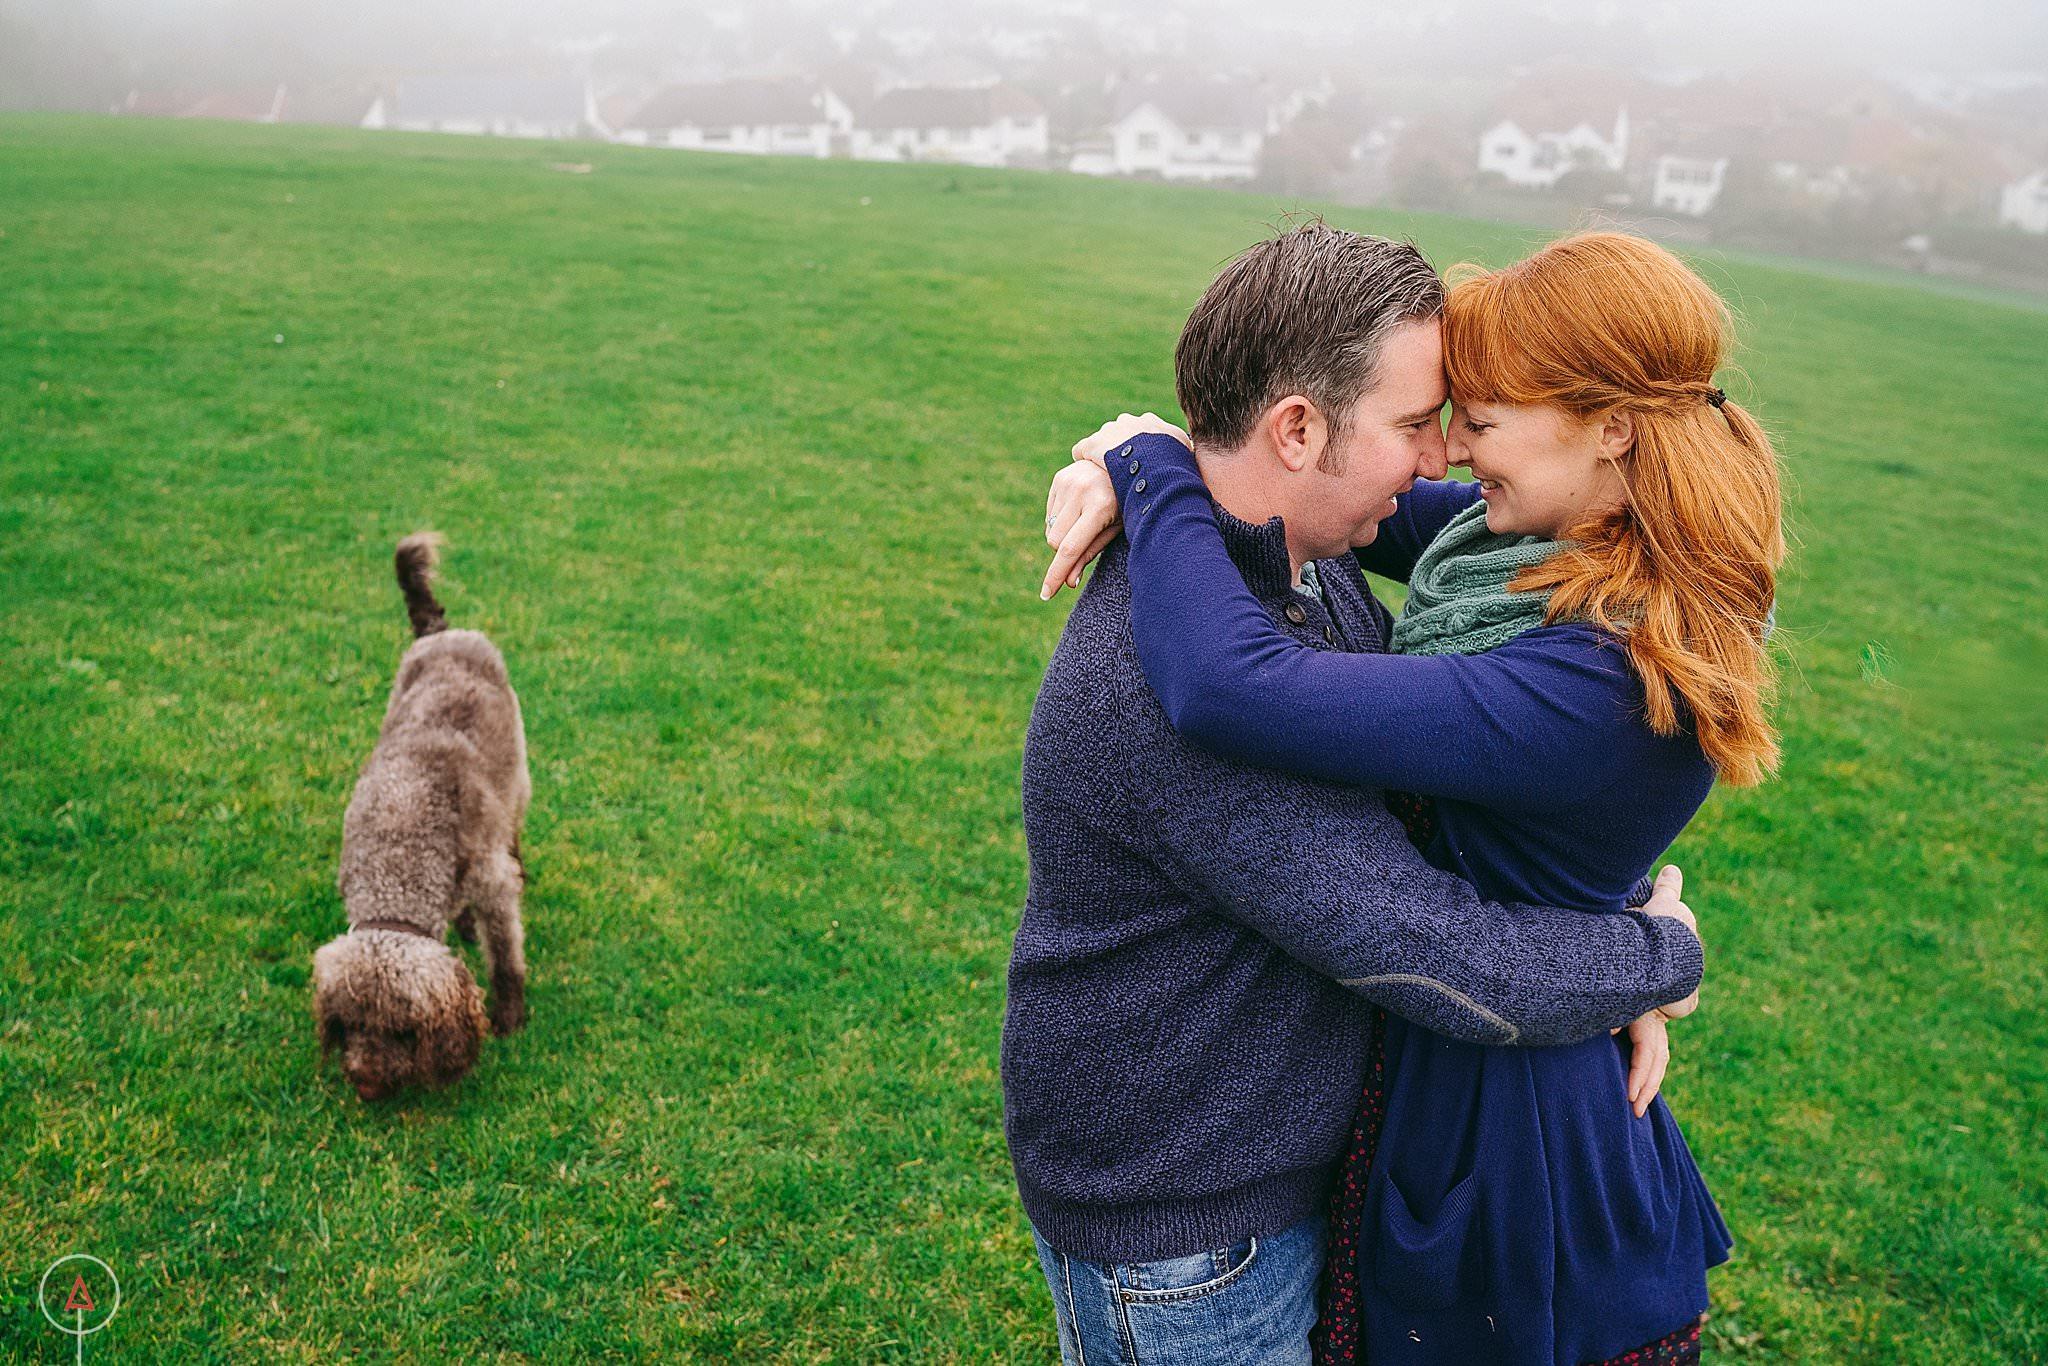 South-Wales-Pre-Wedding-Photography-Aga-Tomaszek-00014